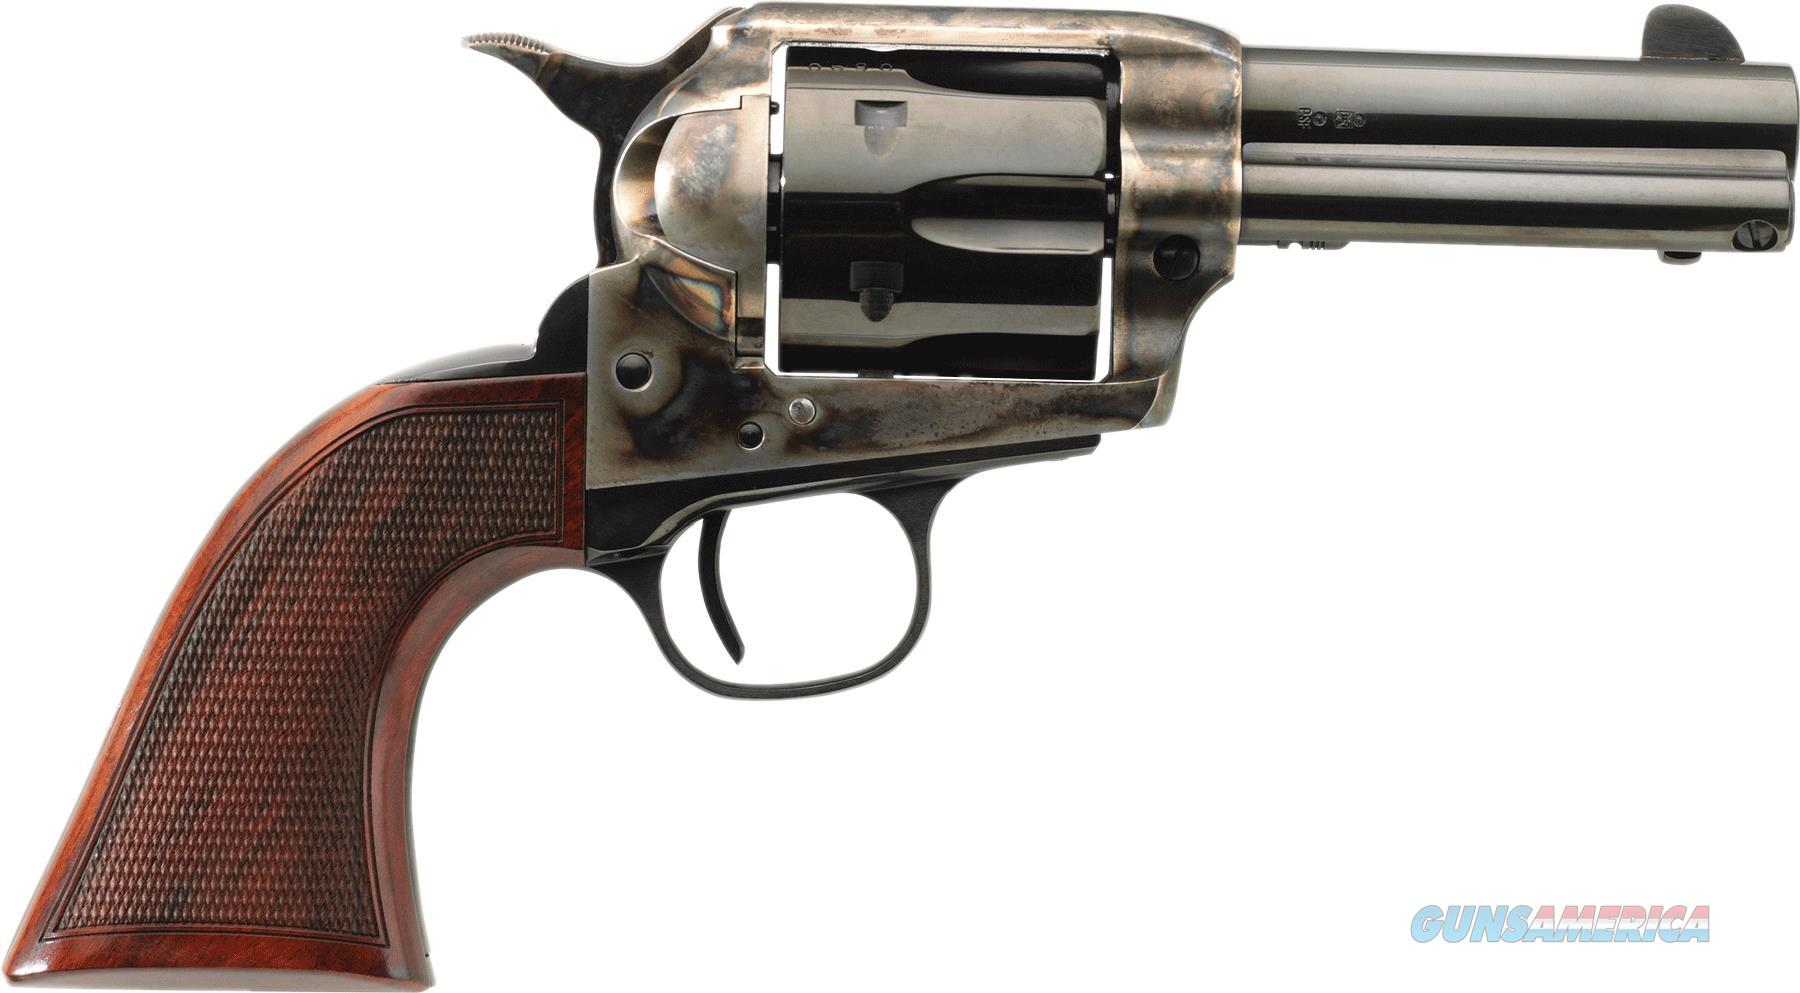 "Taylors&Co 4203 Runnin Iron 45Lc 4.75"" 6Rd Checkered Walnut Grip Blued 4203  Guns > Pistols > TU Misc Pistols"